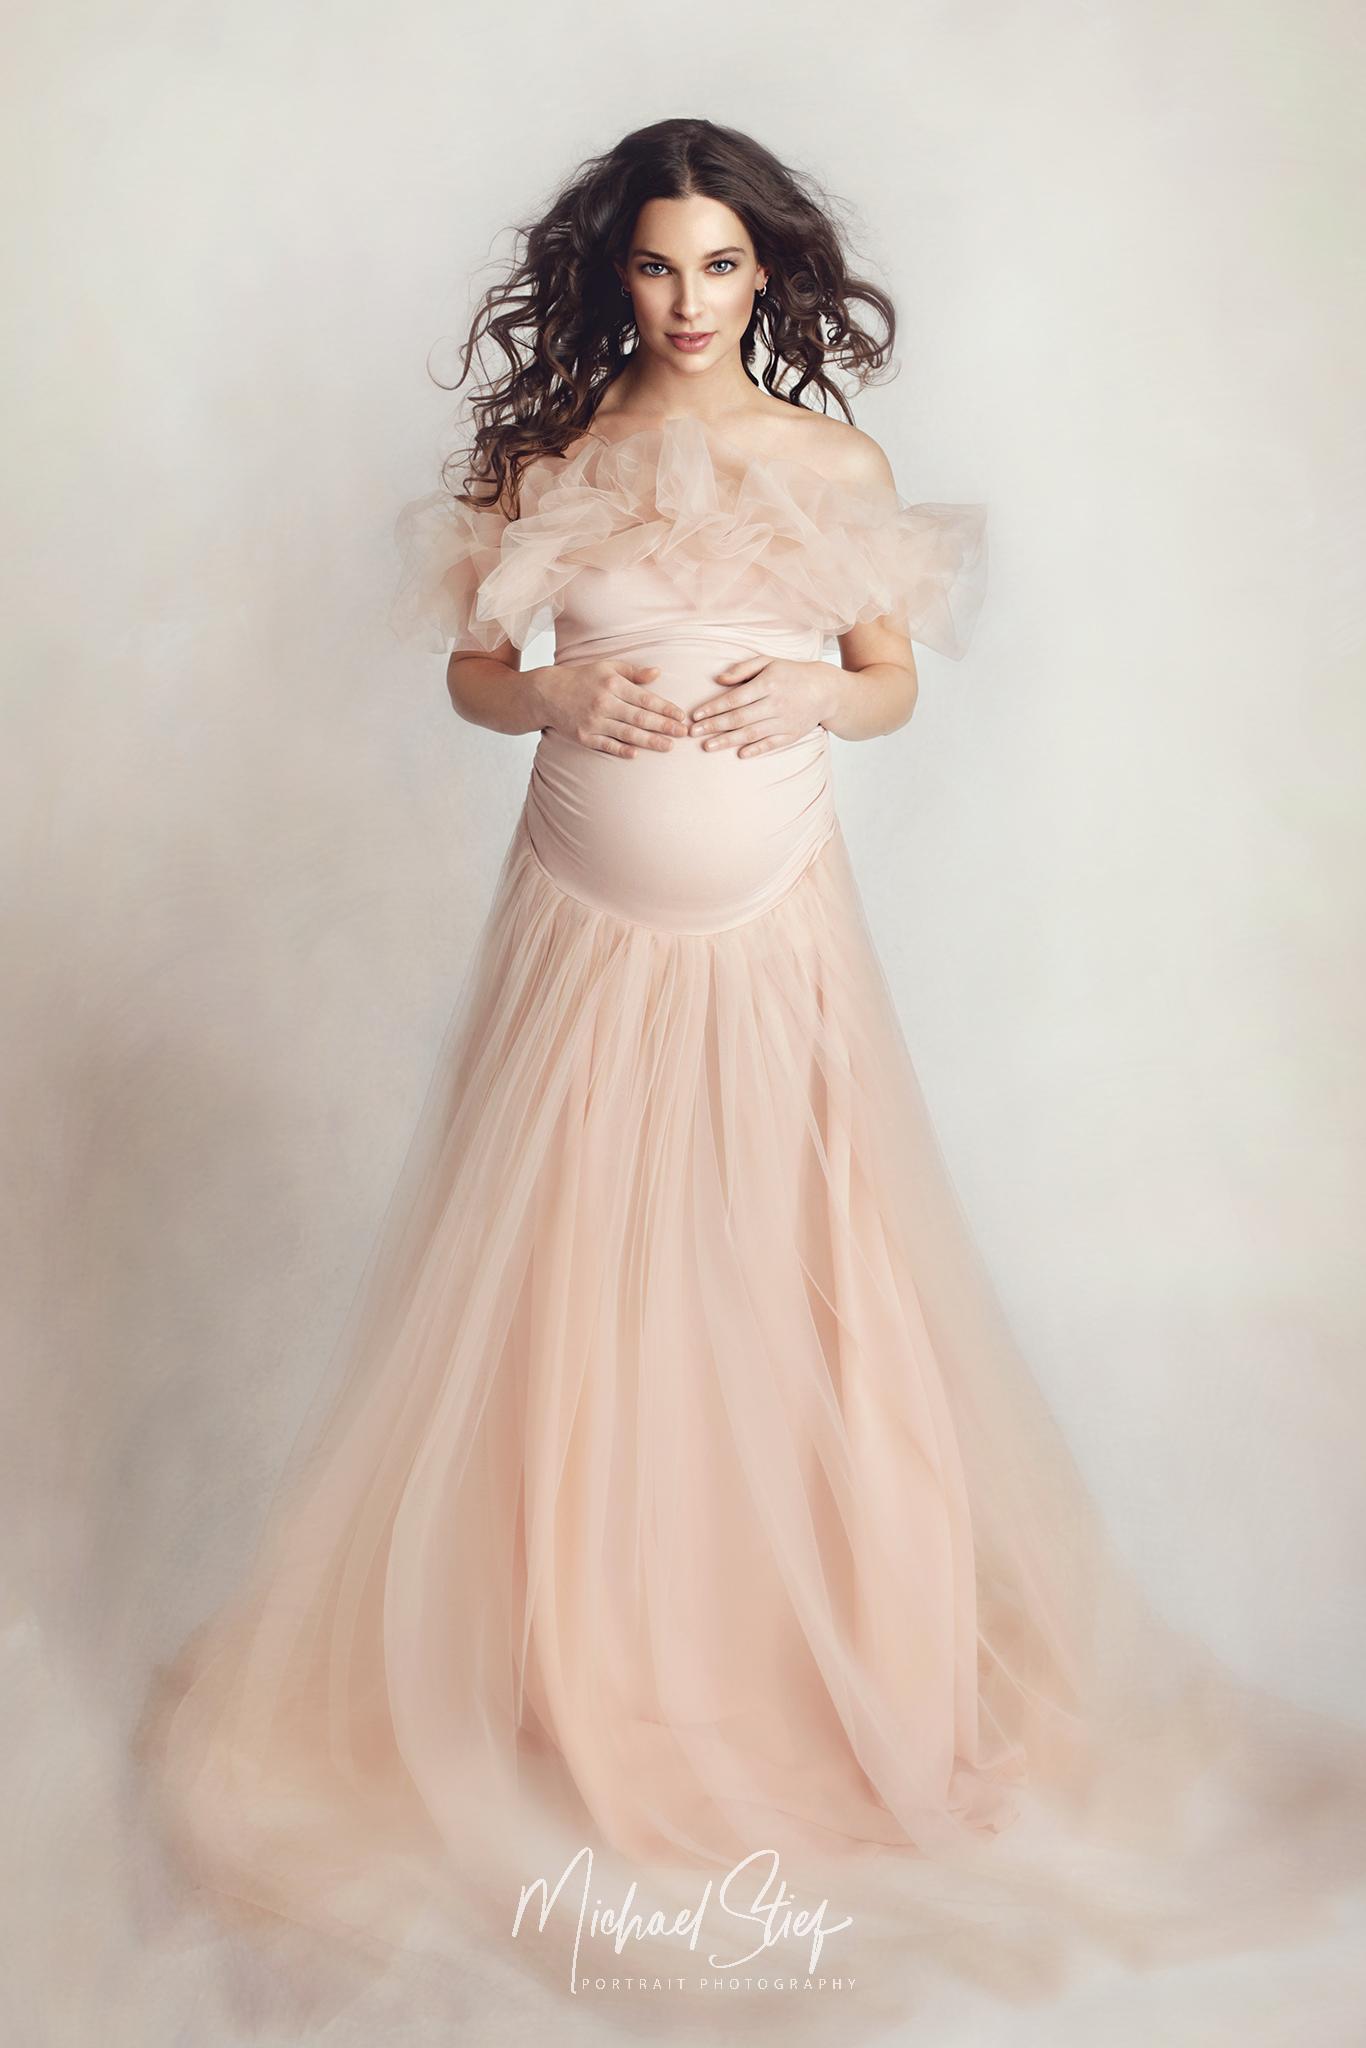 Michael Stief - Maternity Photography 8432.jpg